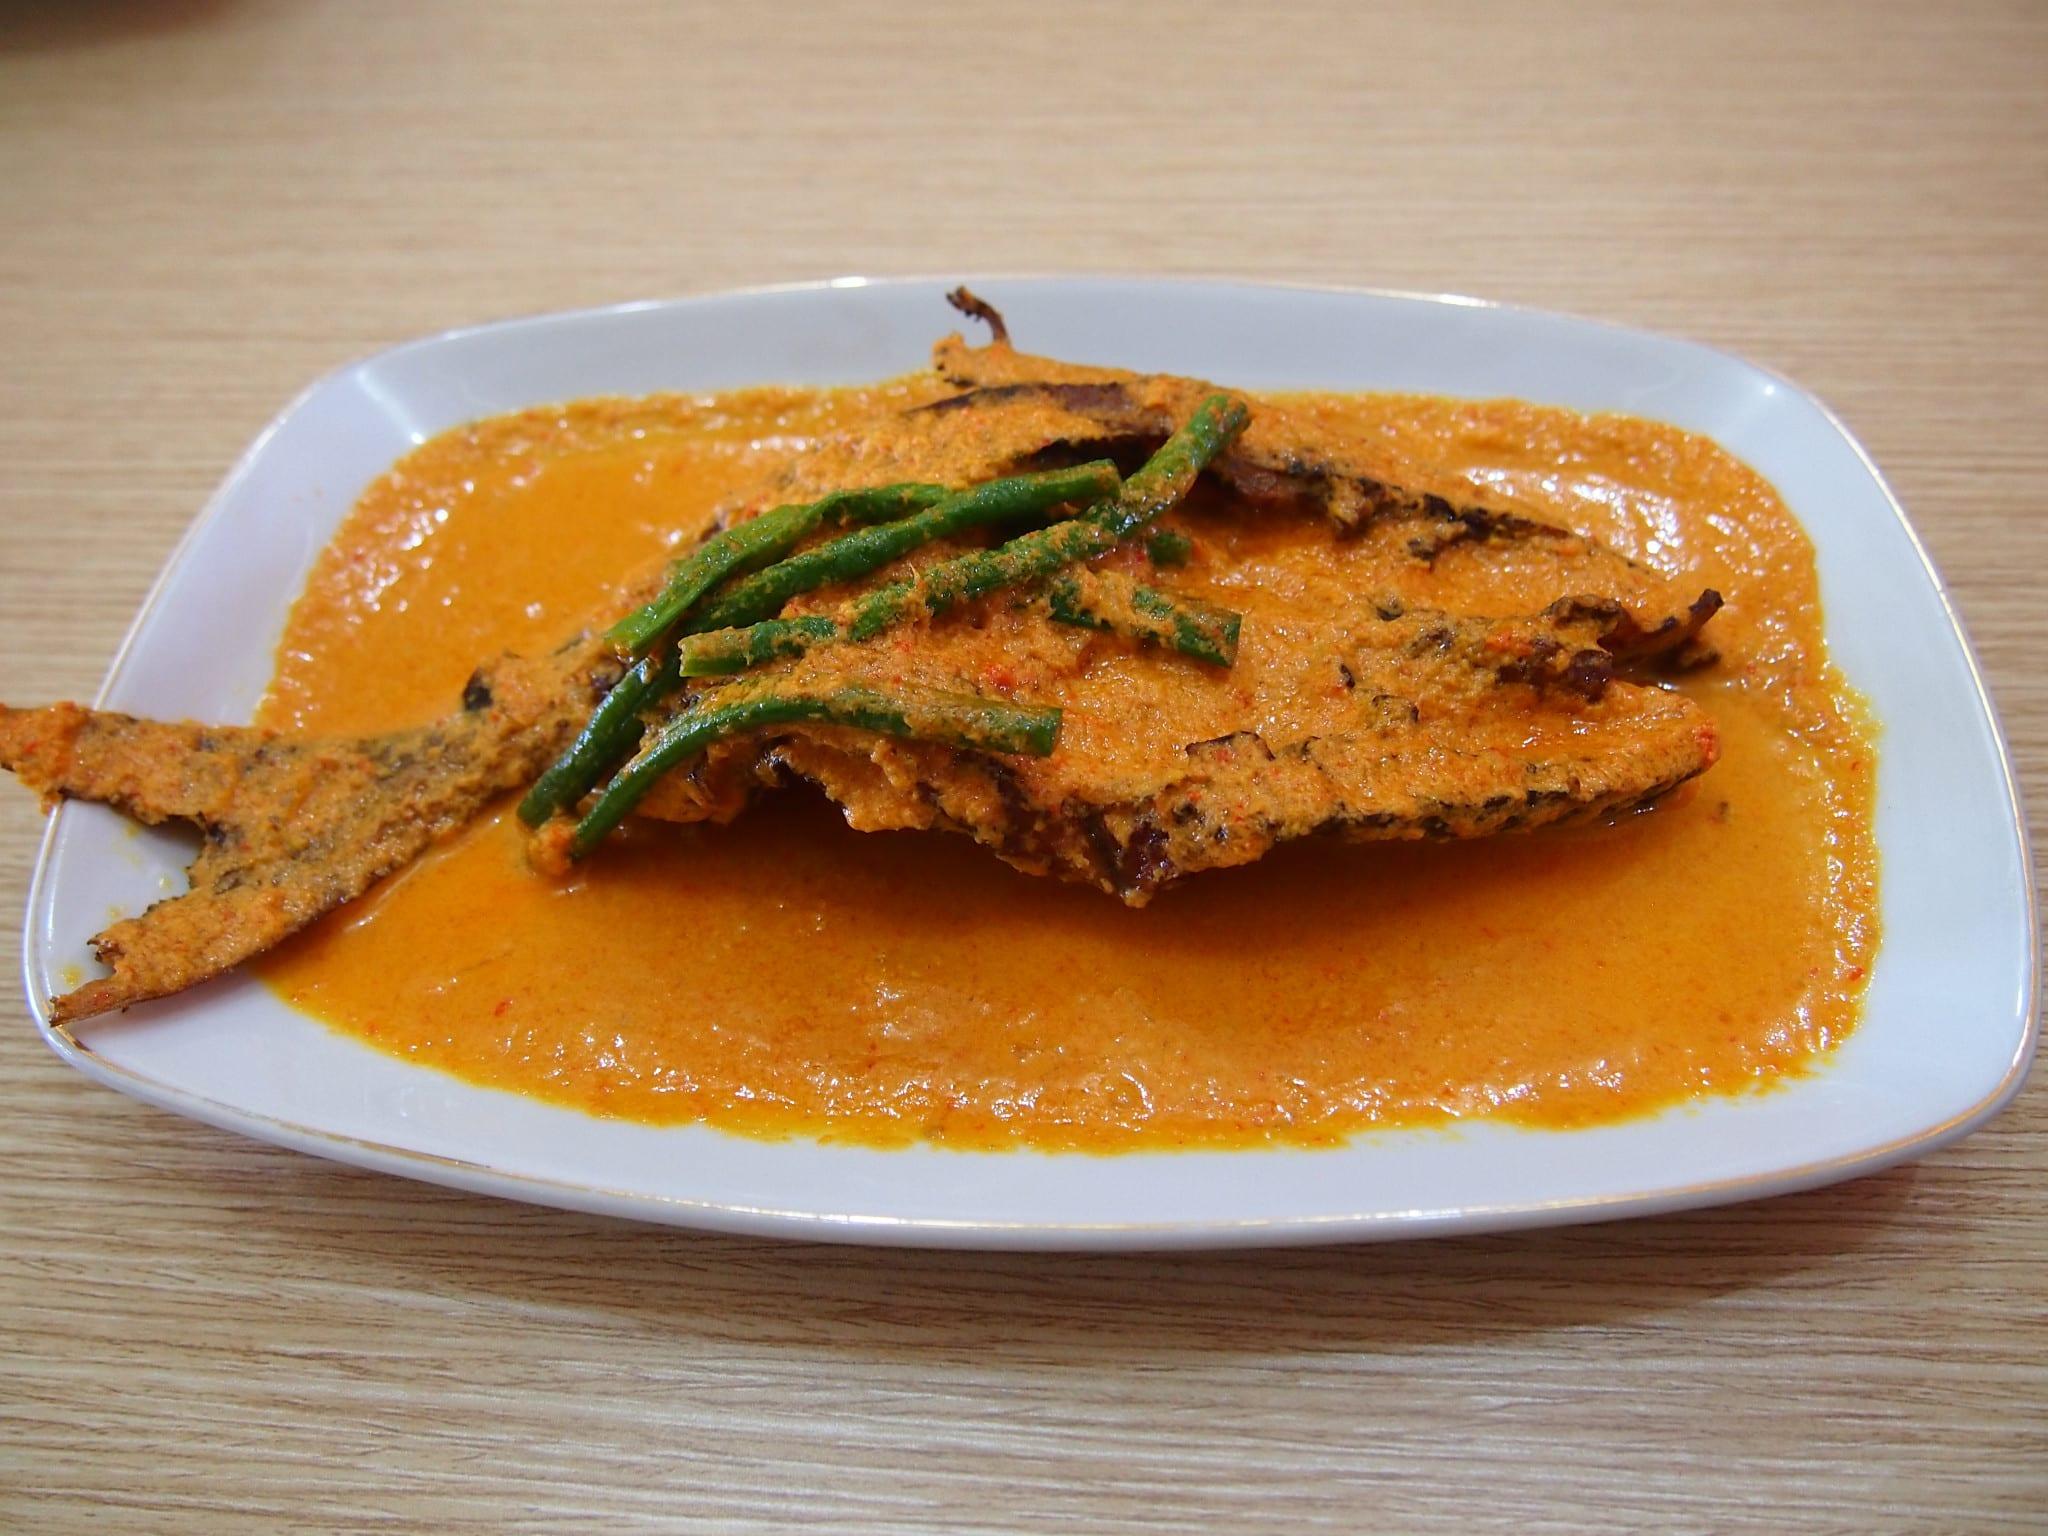 Gulai ikan salai Khas Riau